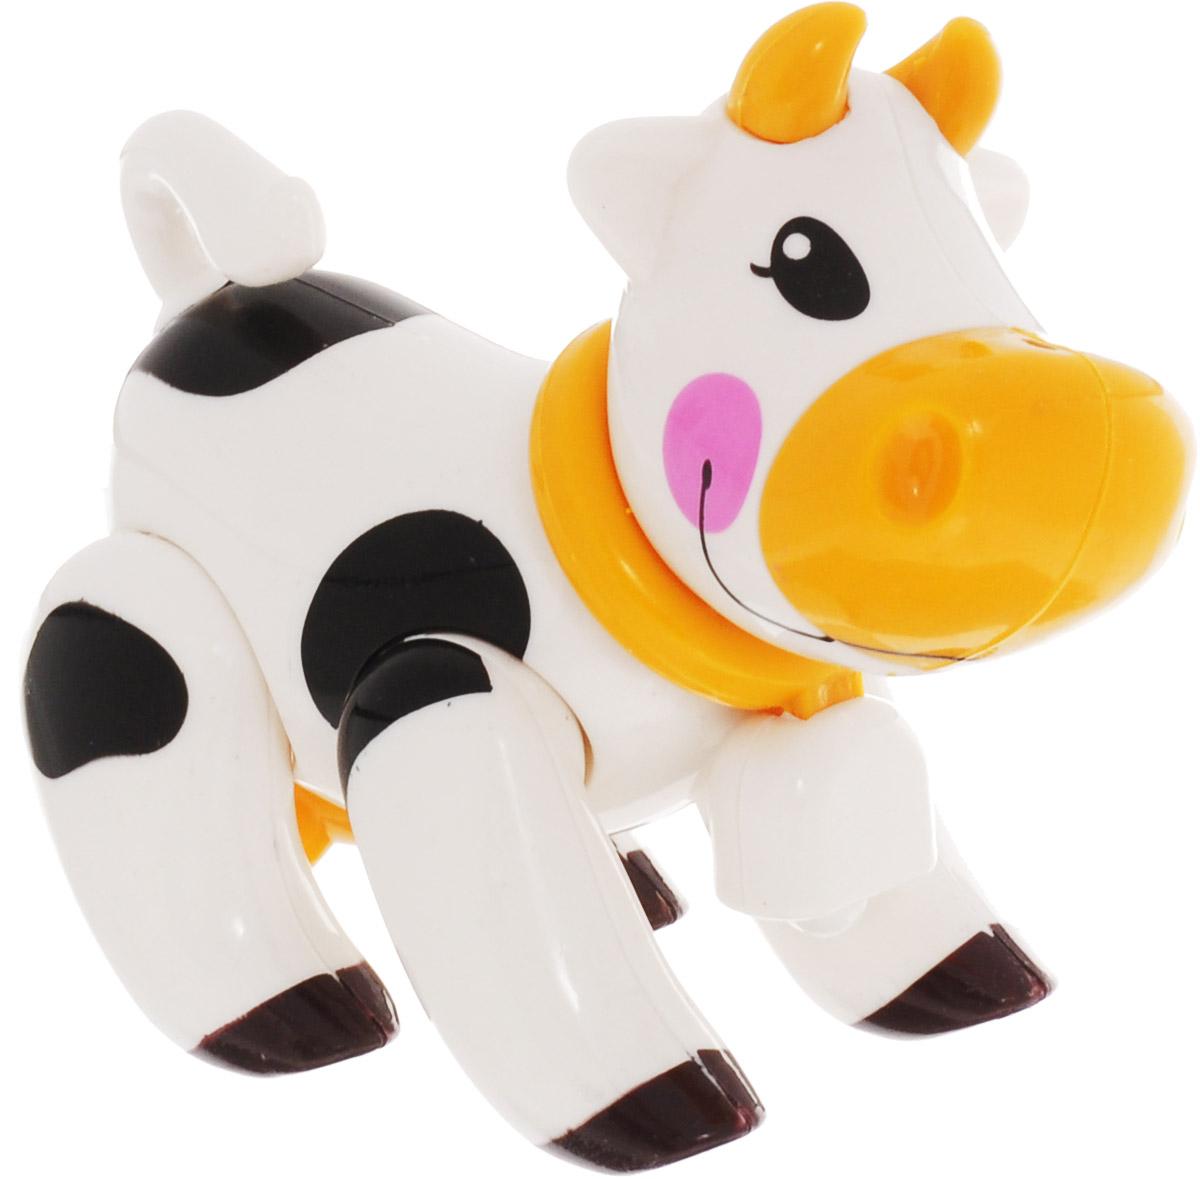 Ути-Пути Развивающая игрушка Корова цвет белый ю каталог ути пути